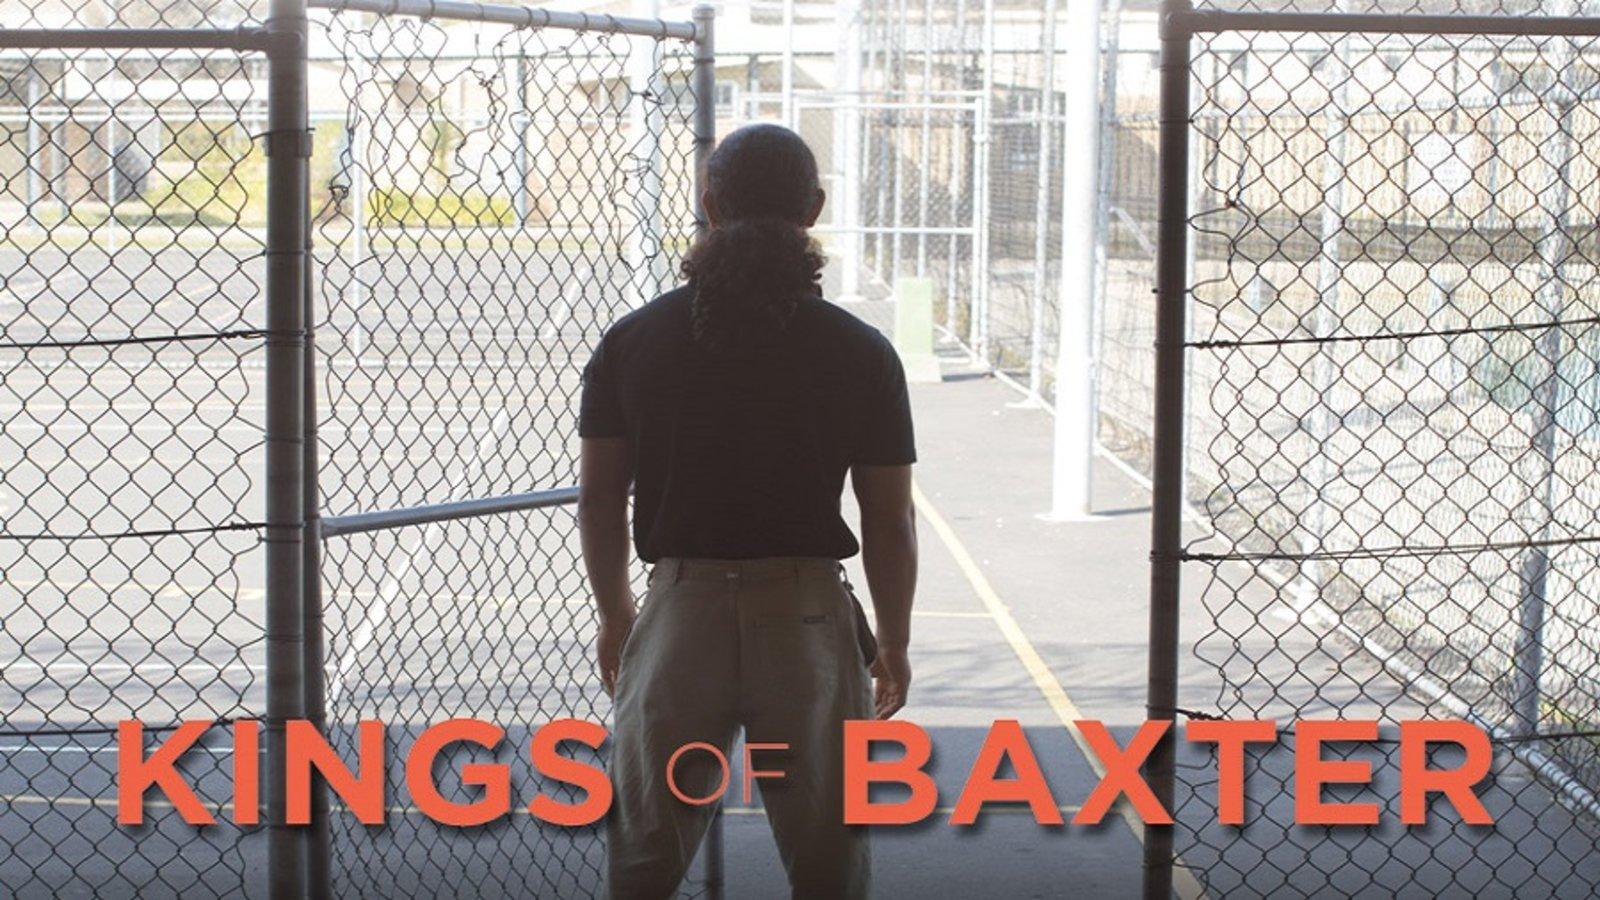 Kings of Baxter - Can Twelve Teenage Offenders Conquer Macbeth?